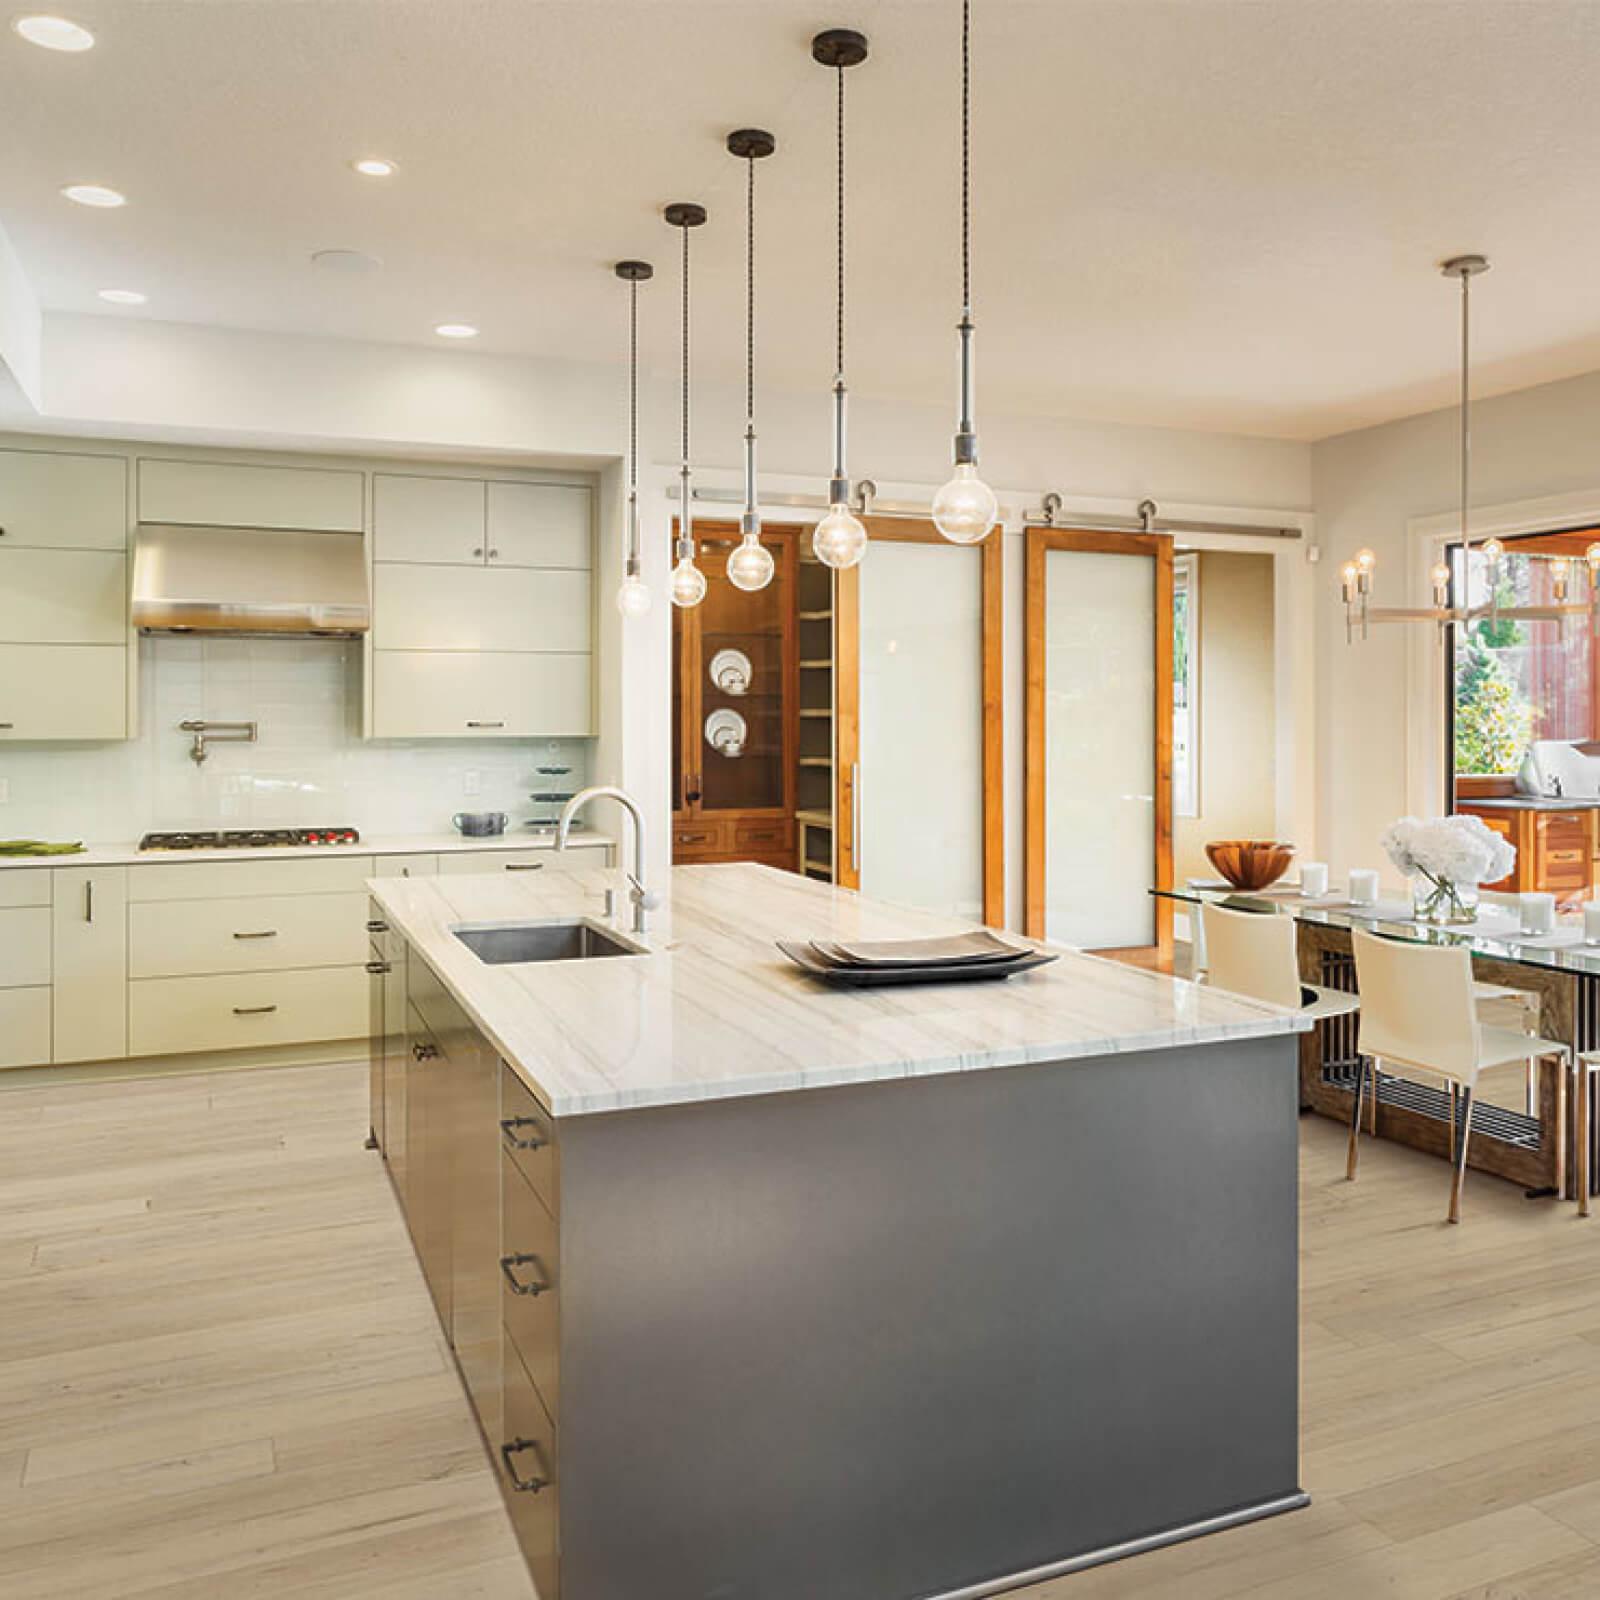 Kitchen flooring | McSwain Carpet & Floors